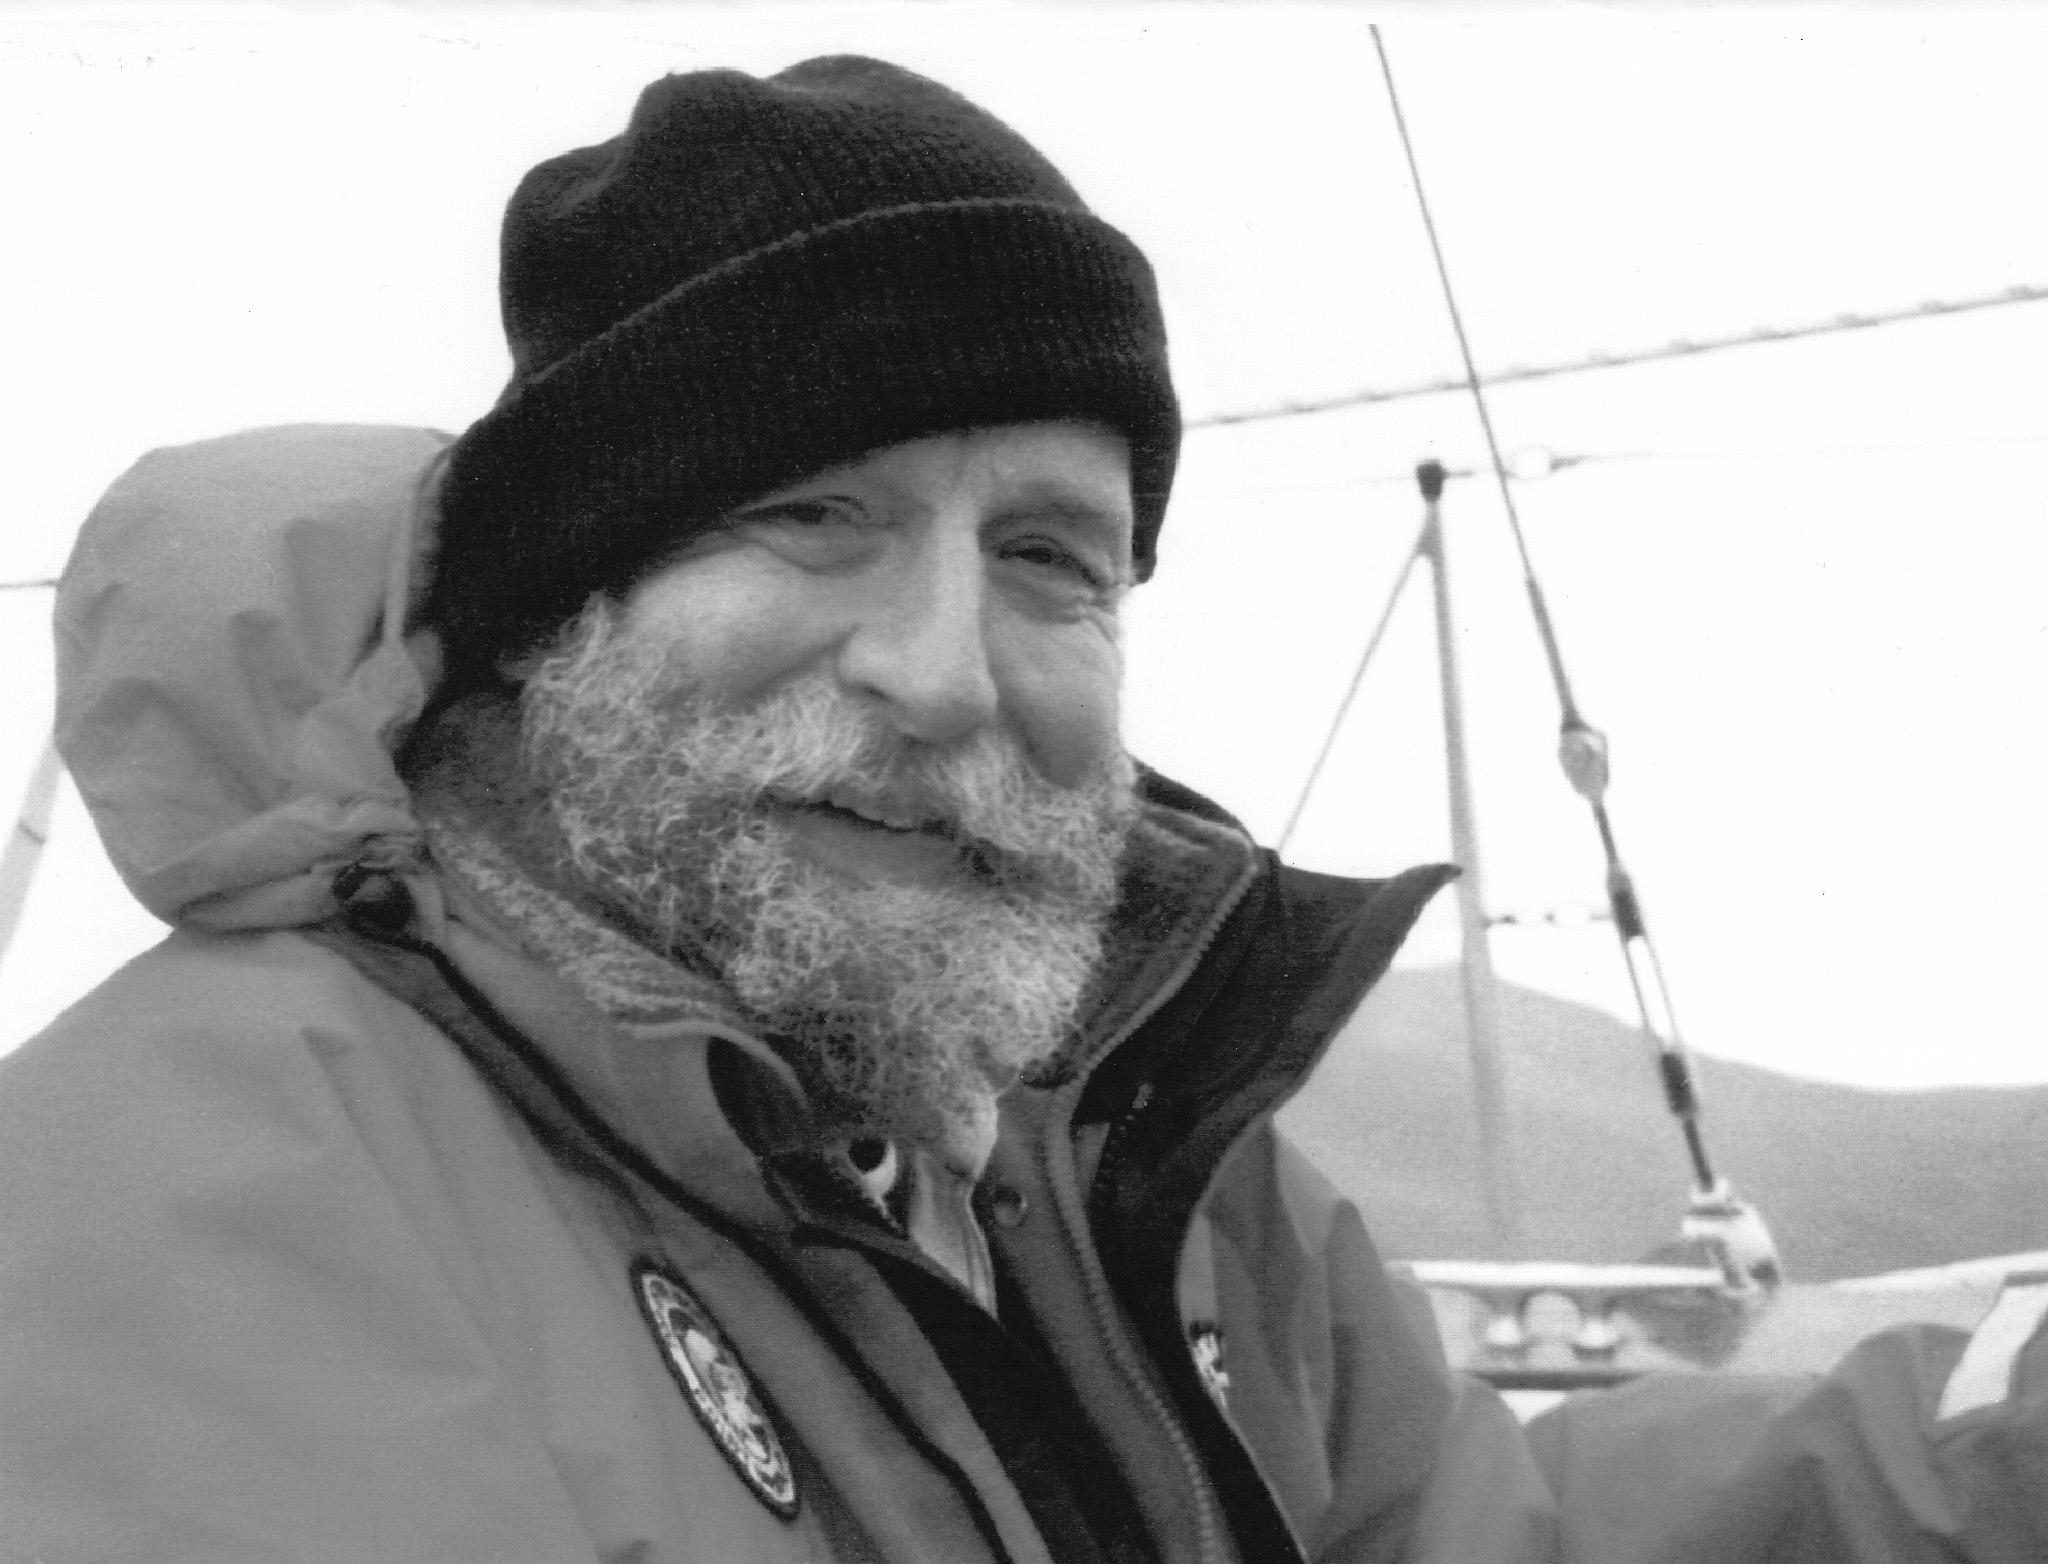 Captain Jack Johnson at Sea